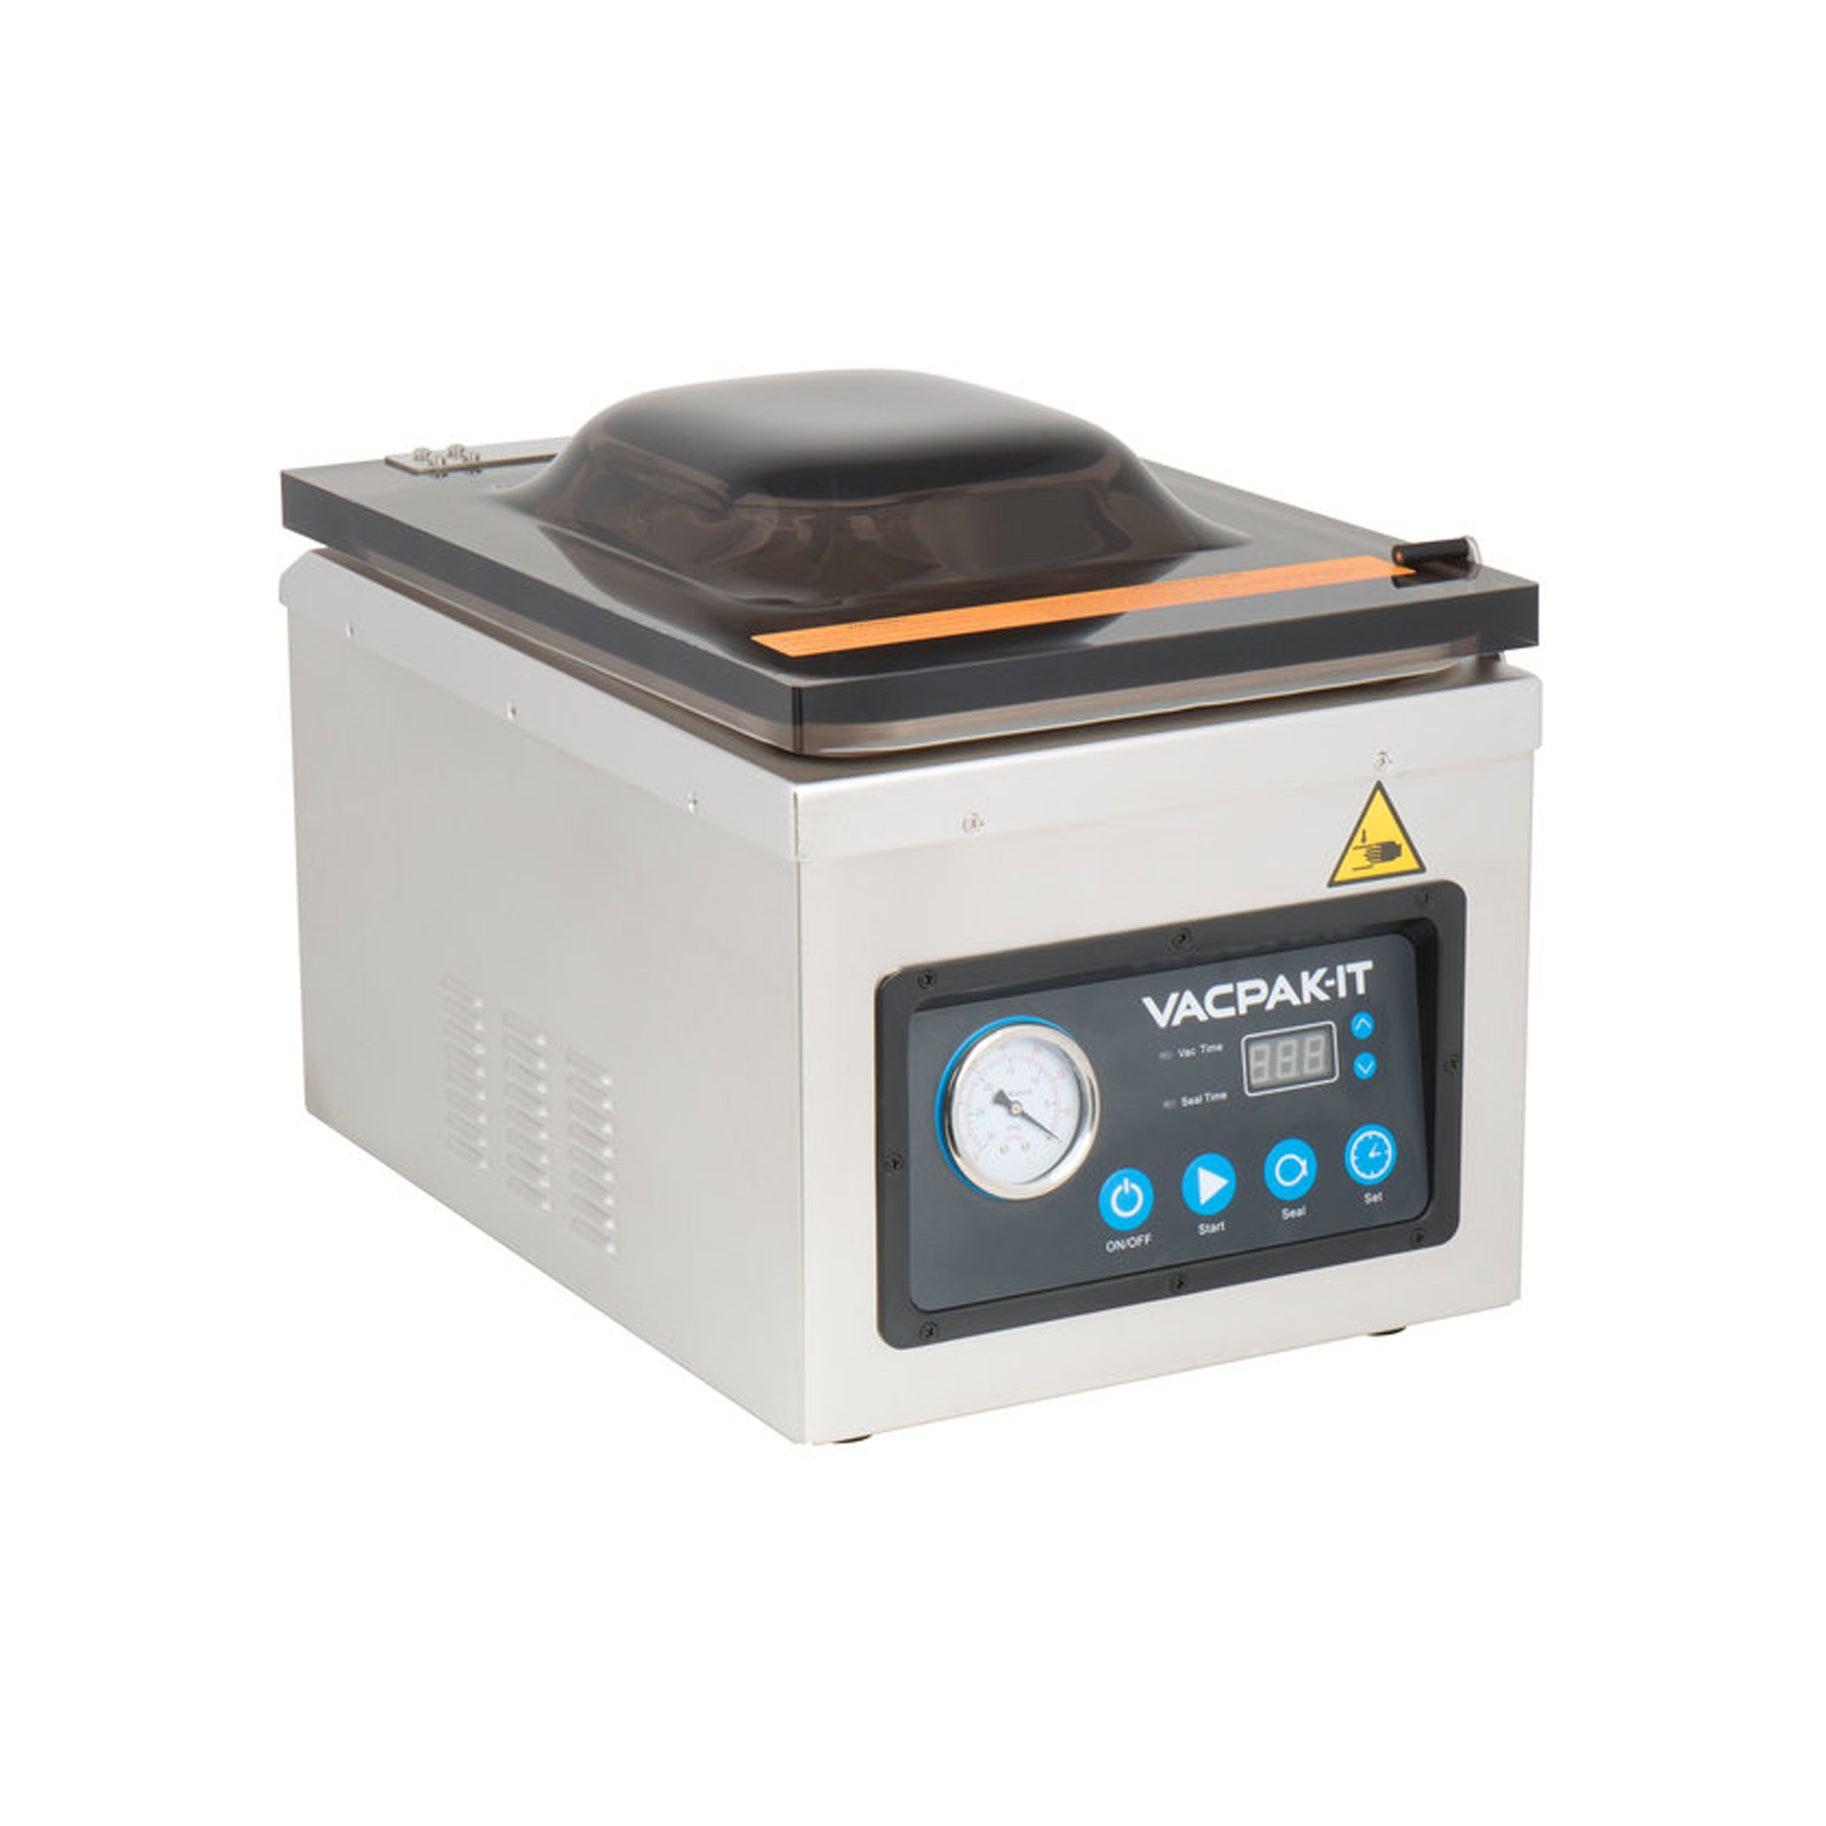 The Best Food Storage Container Option: VacPak-It VMC100P Chamber Vacuum Packaging Machine